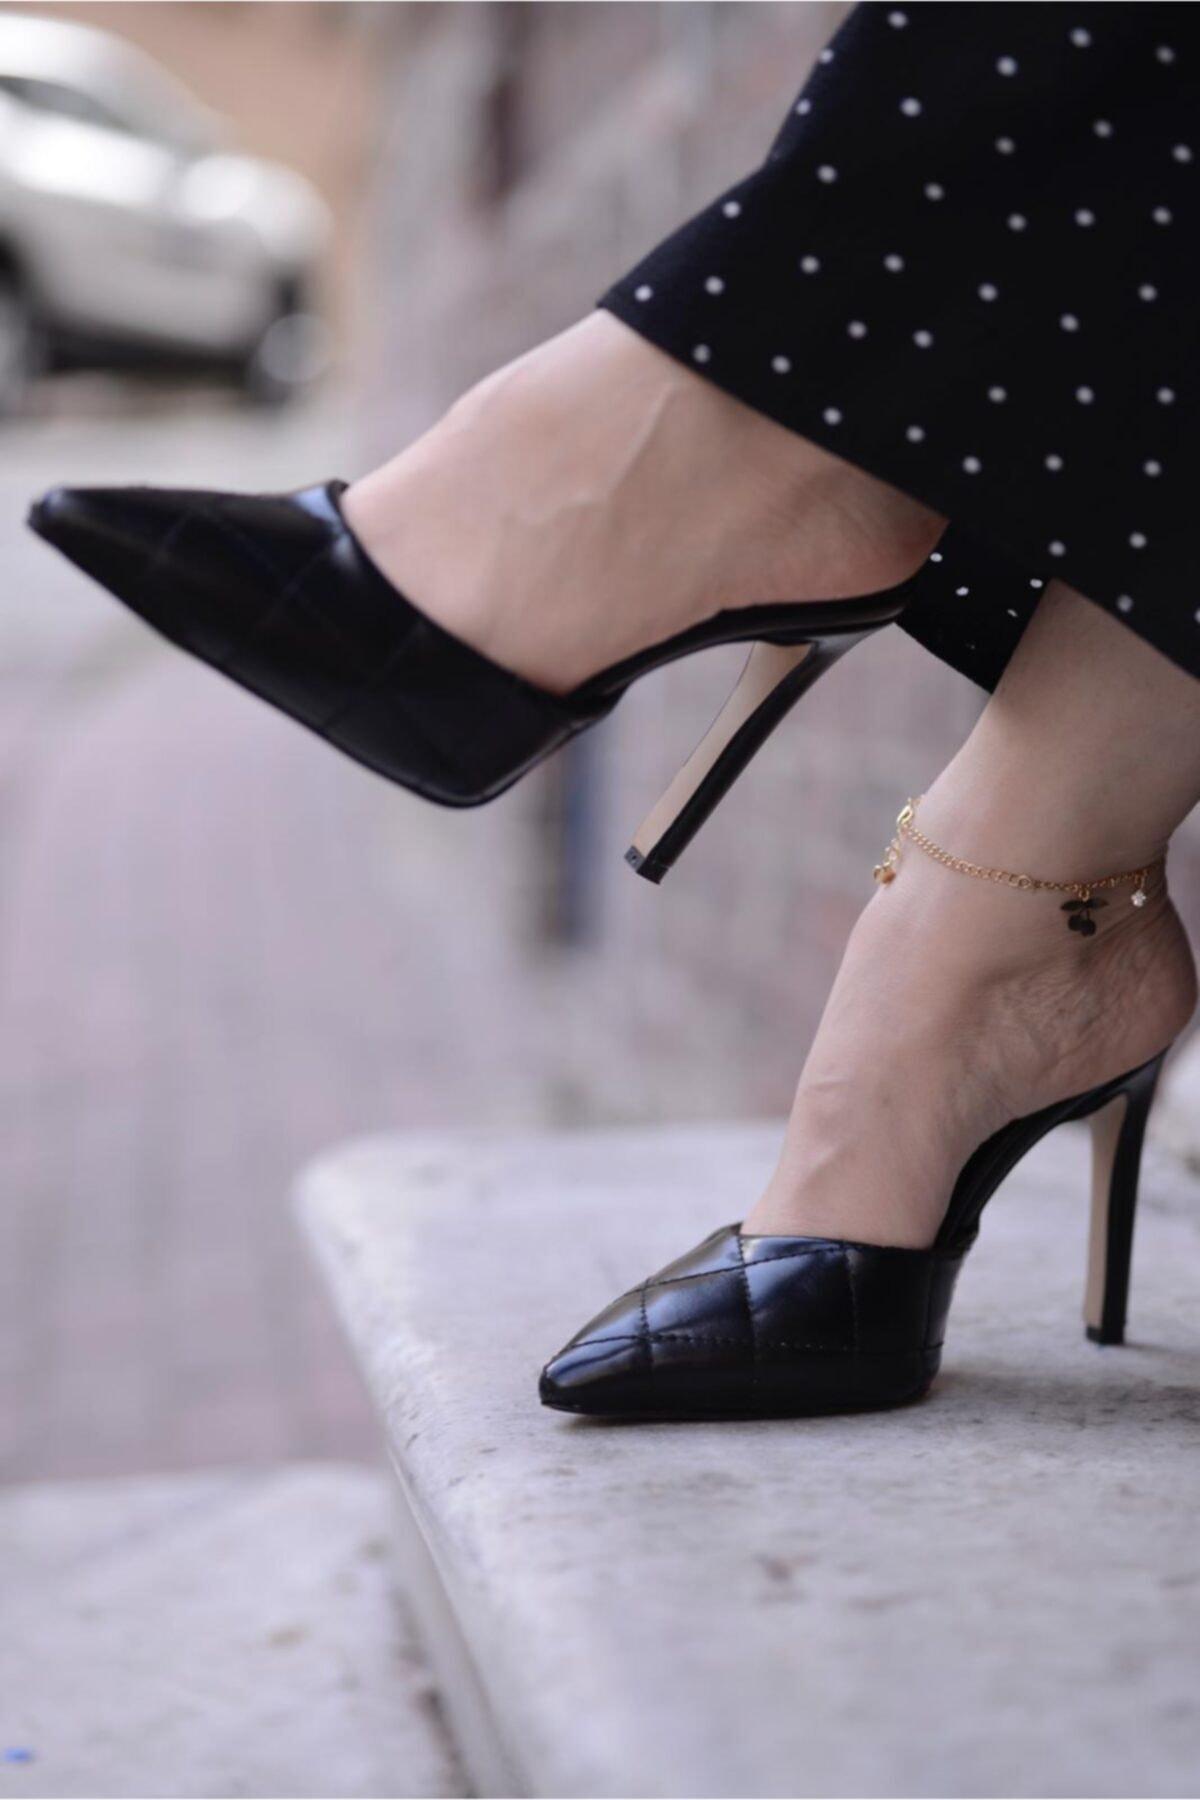 Malina Ayakkabı Çanta Kadın Siyah Sivri Kapalı Burun Topuklu Terlik 2